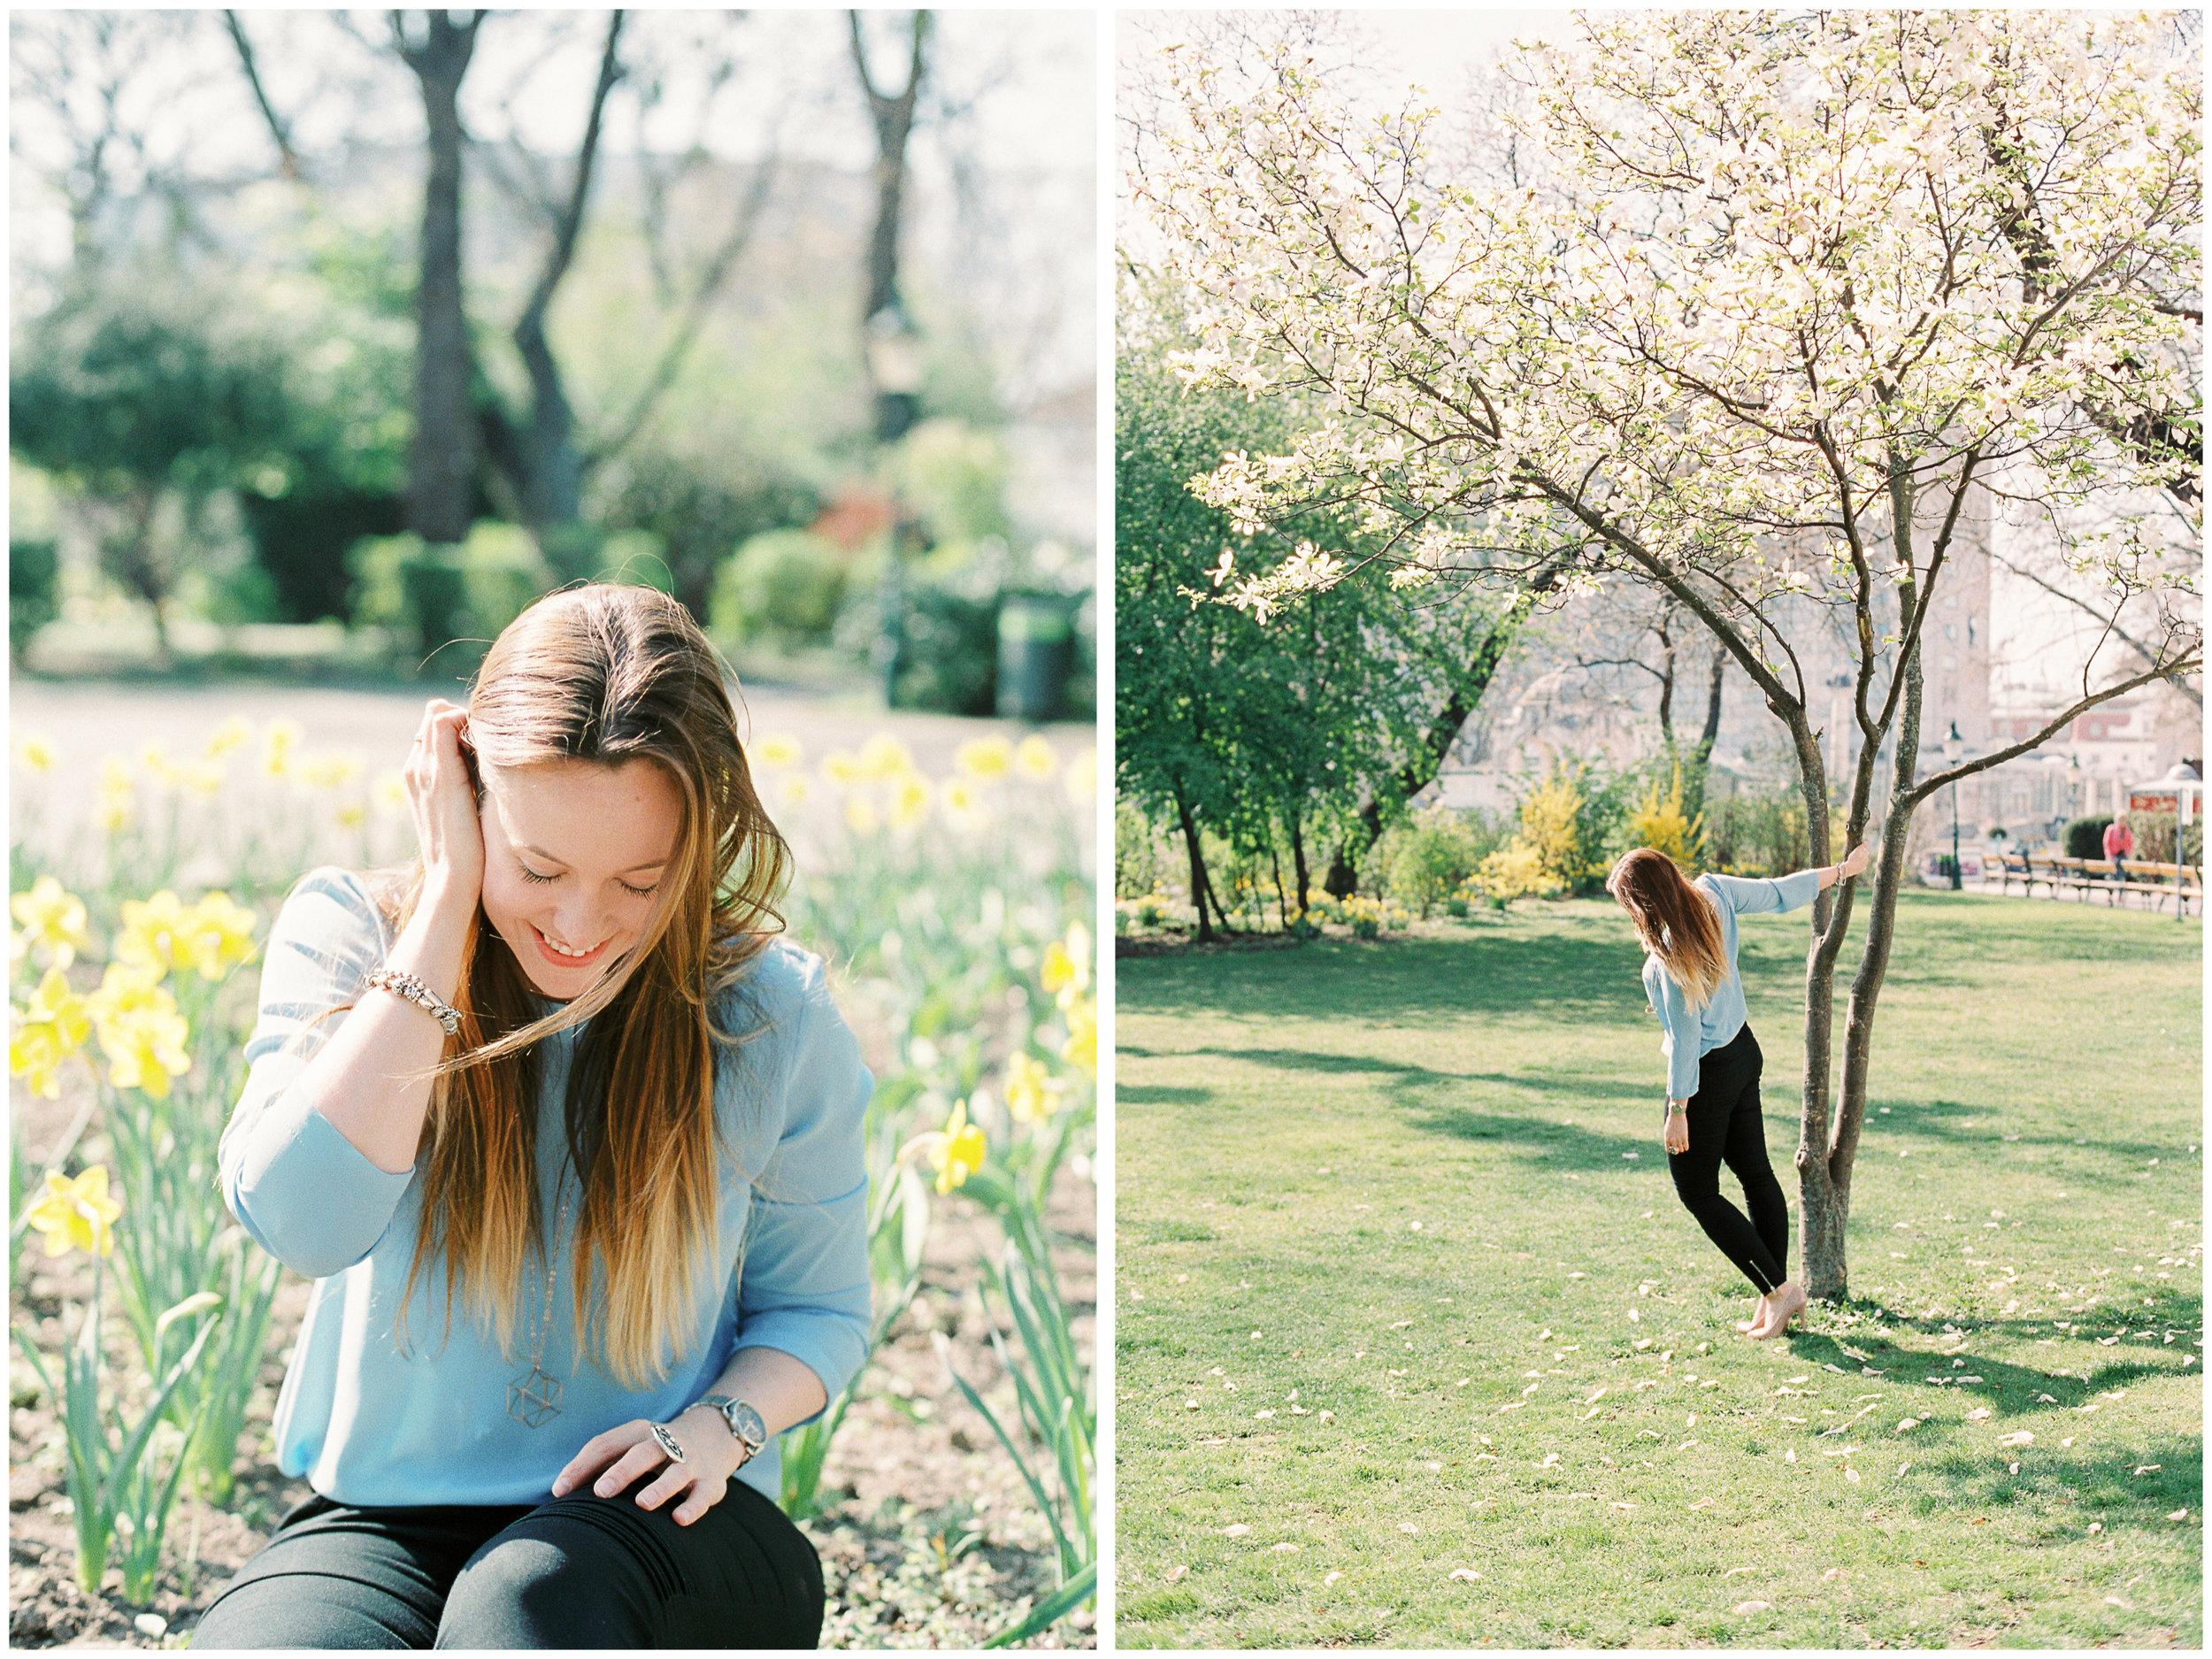 Blogger Portraits | Vienna, Austria | Michelle Mock Photography | Vienna Portrait Photographer | Vienna Film Photographer | Canon 1V | Fuji400